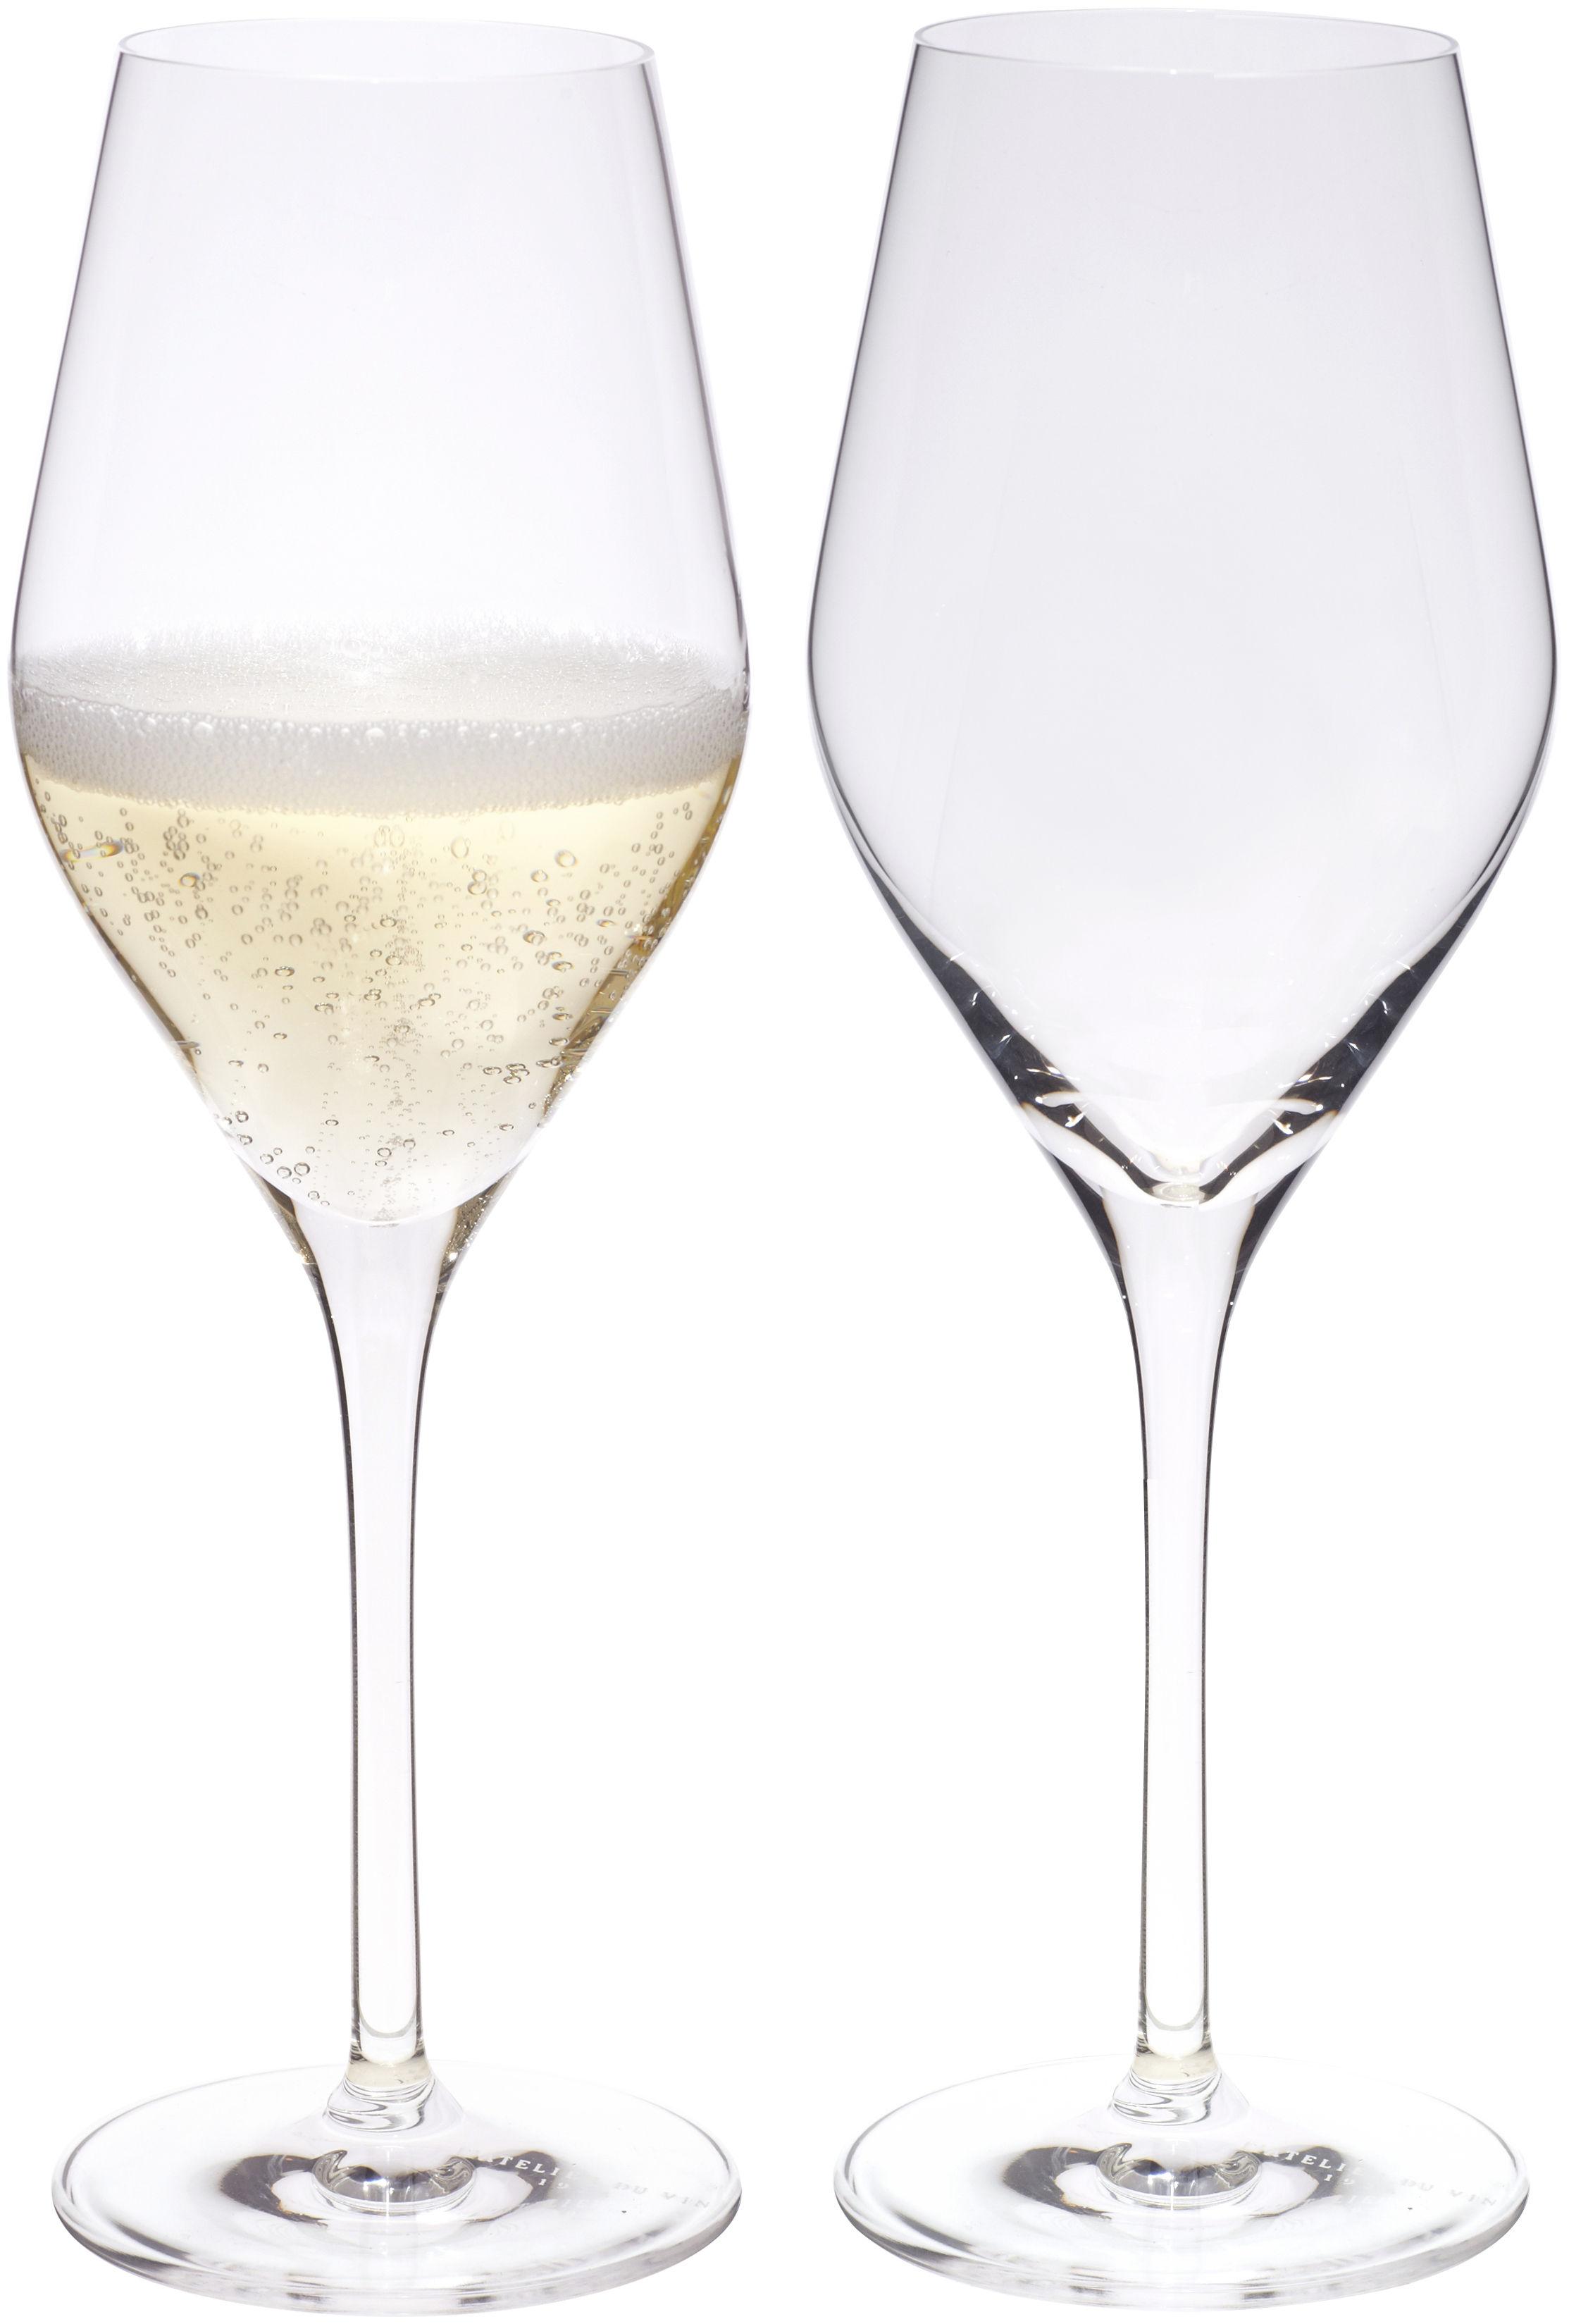 Tavola - Bicchieri  - Flûte da champagne Good Size - / Set da 2 di L'Atelier du Vin - Trasparente -  Nesium®, Vetro cristallino soffiato